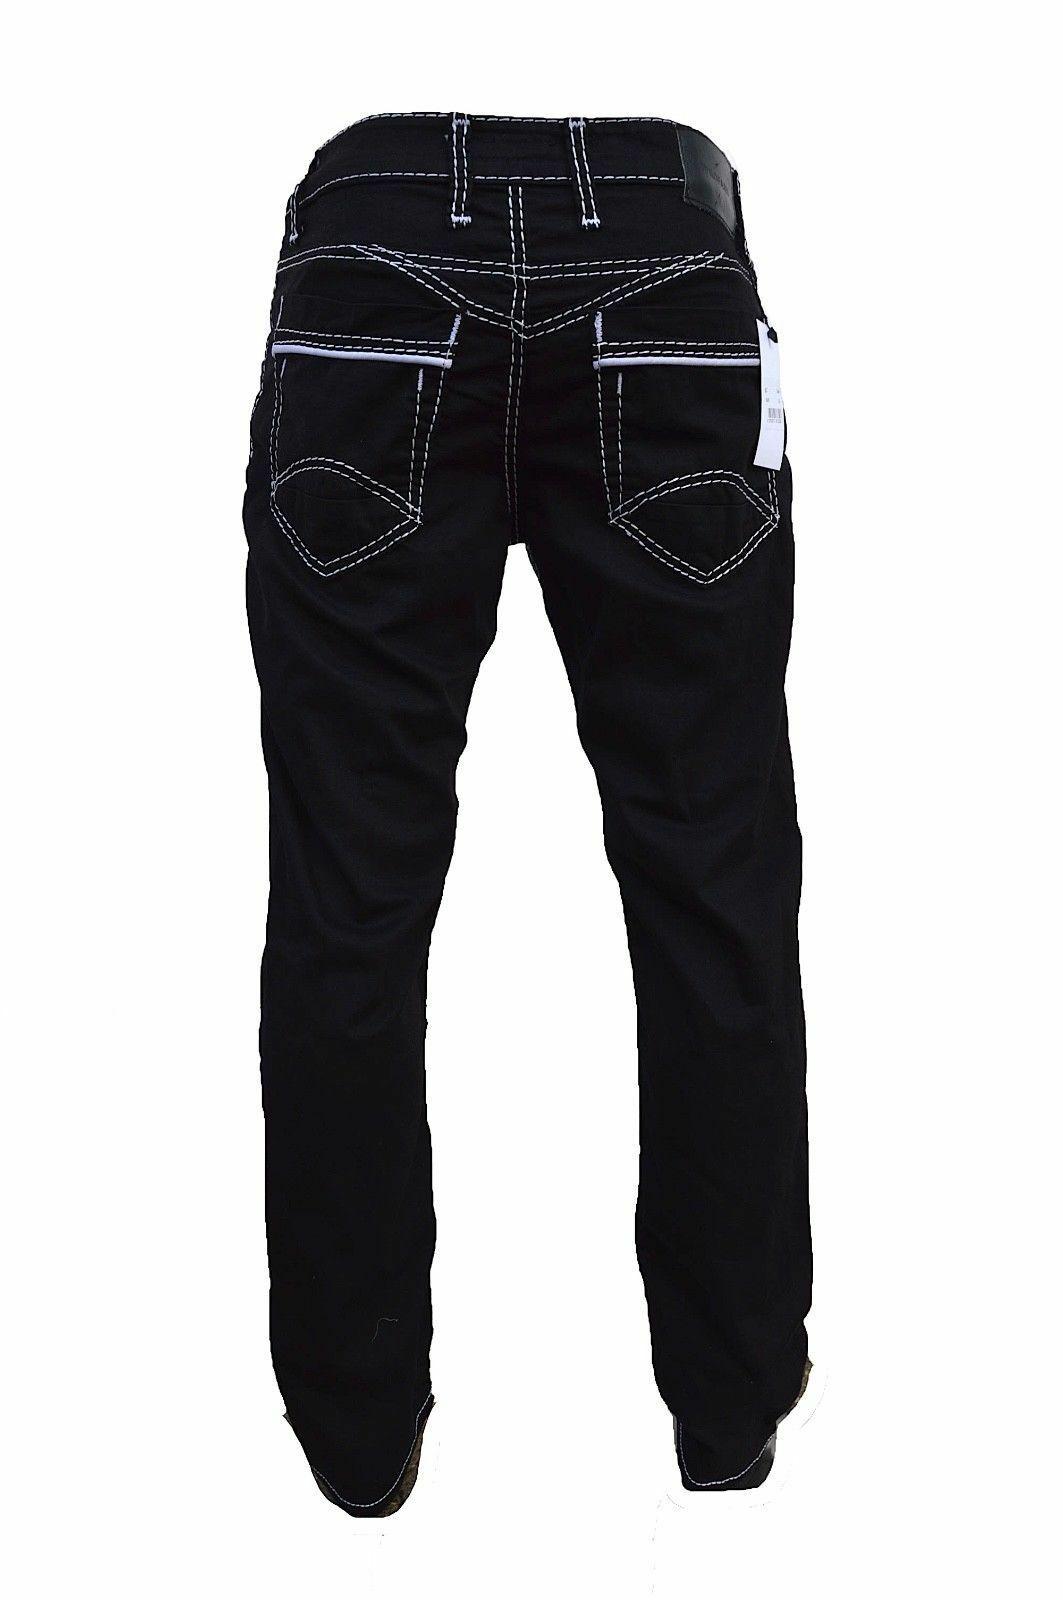 Herren-Jeans-Hose-Denim-KC-Black-Washed-Straight-Cut-Regular-Dicke-Naht-naehte Indexbild 13